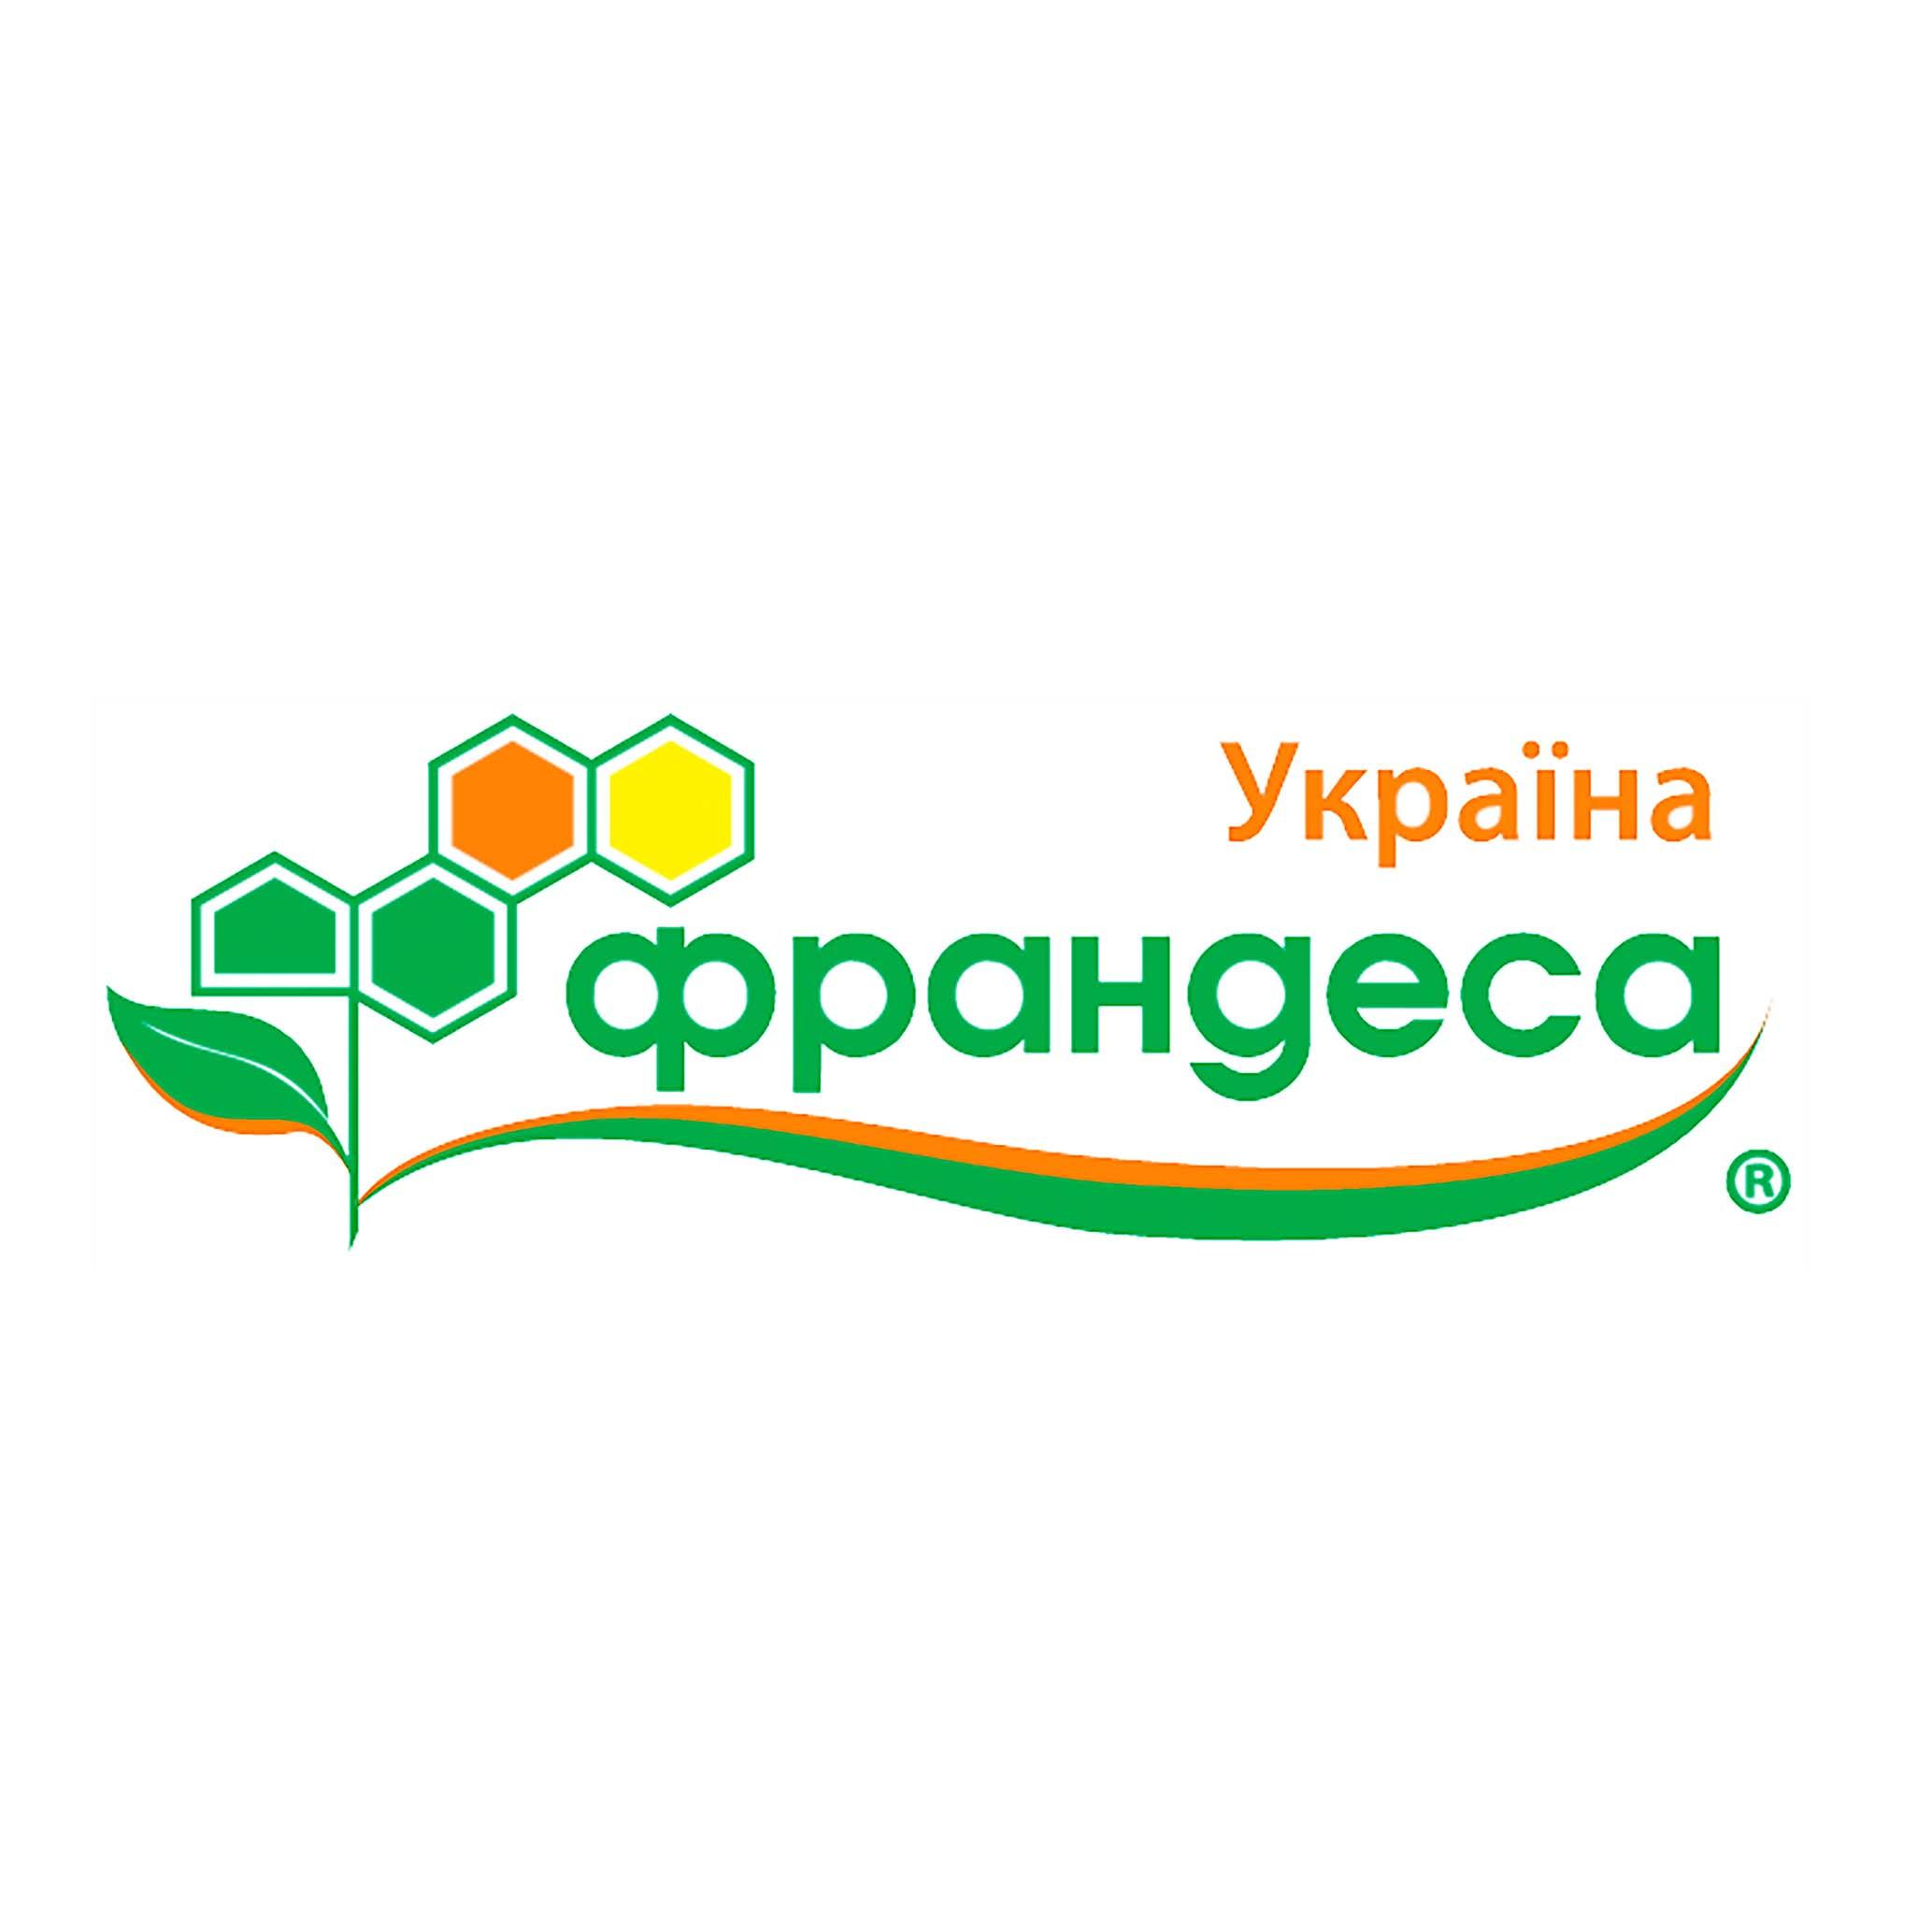 Франдеса Україна ТОВ